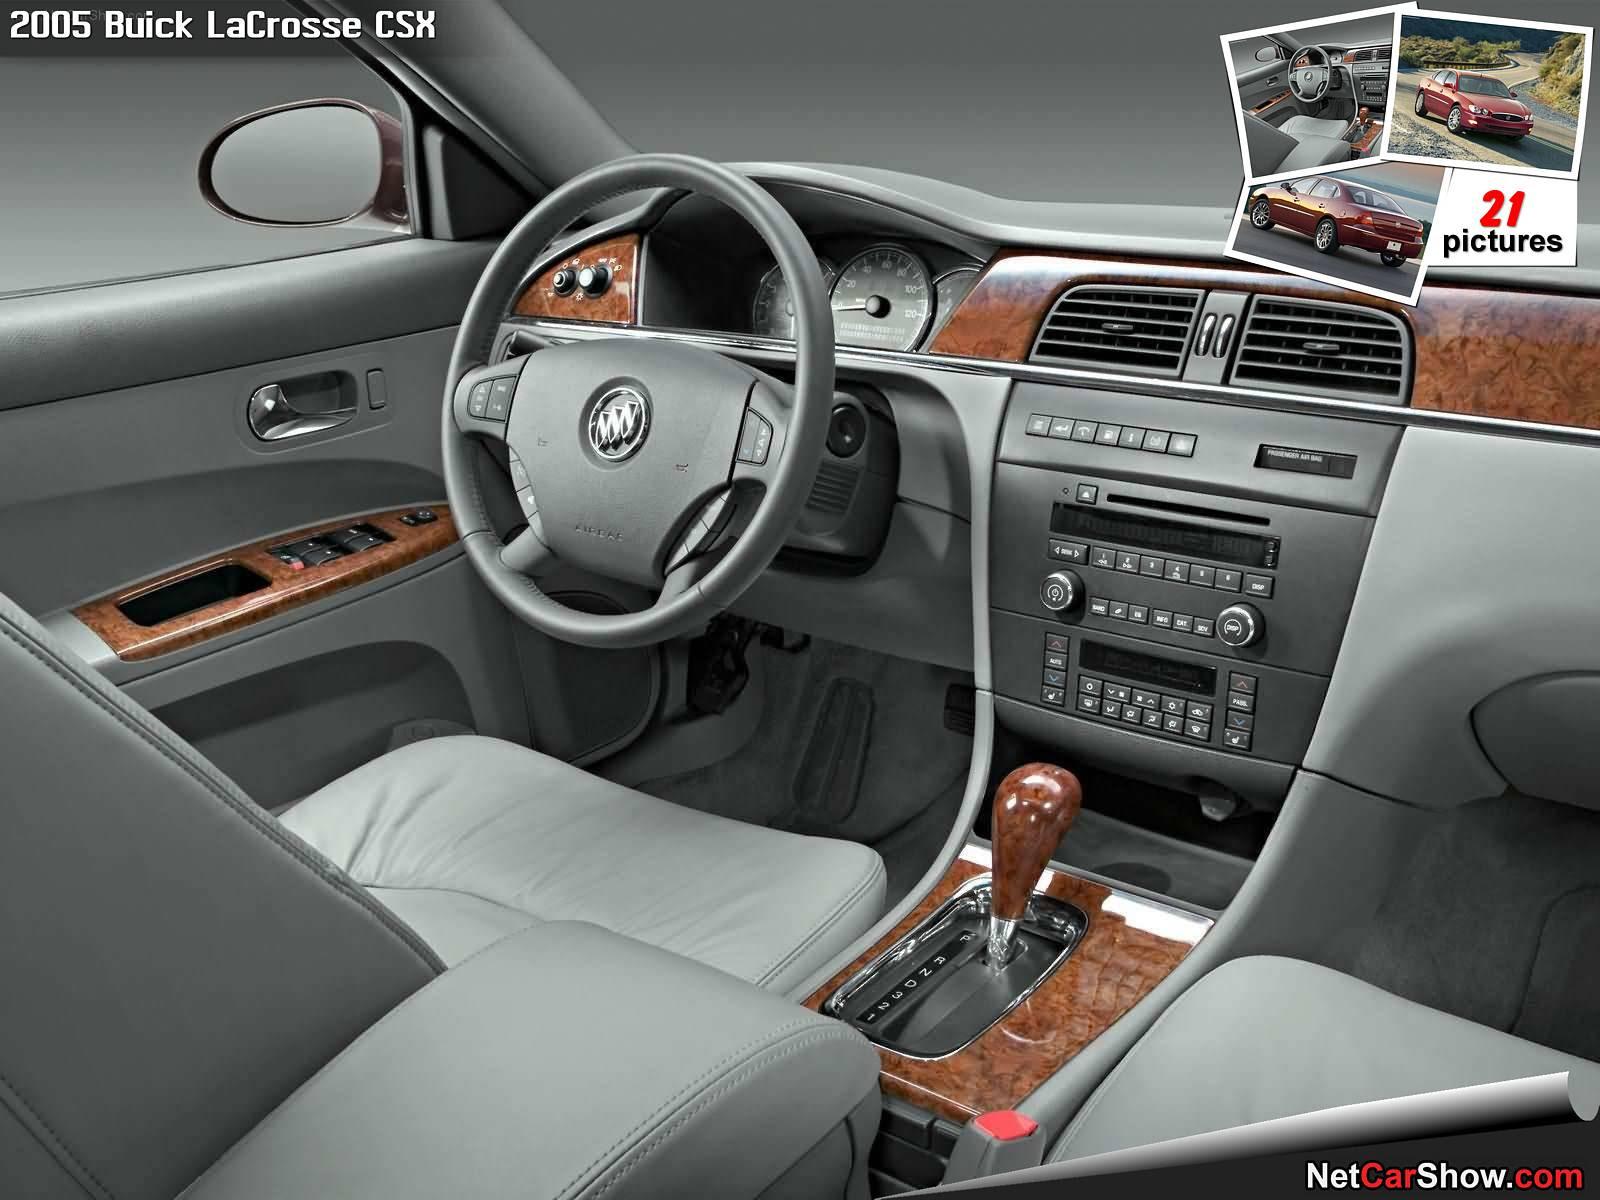 Buick LaCrosse CSX (2005) - Interior - 8 of 21, 1600x1200